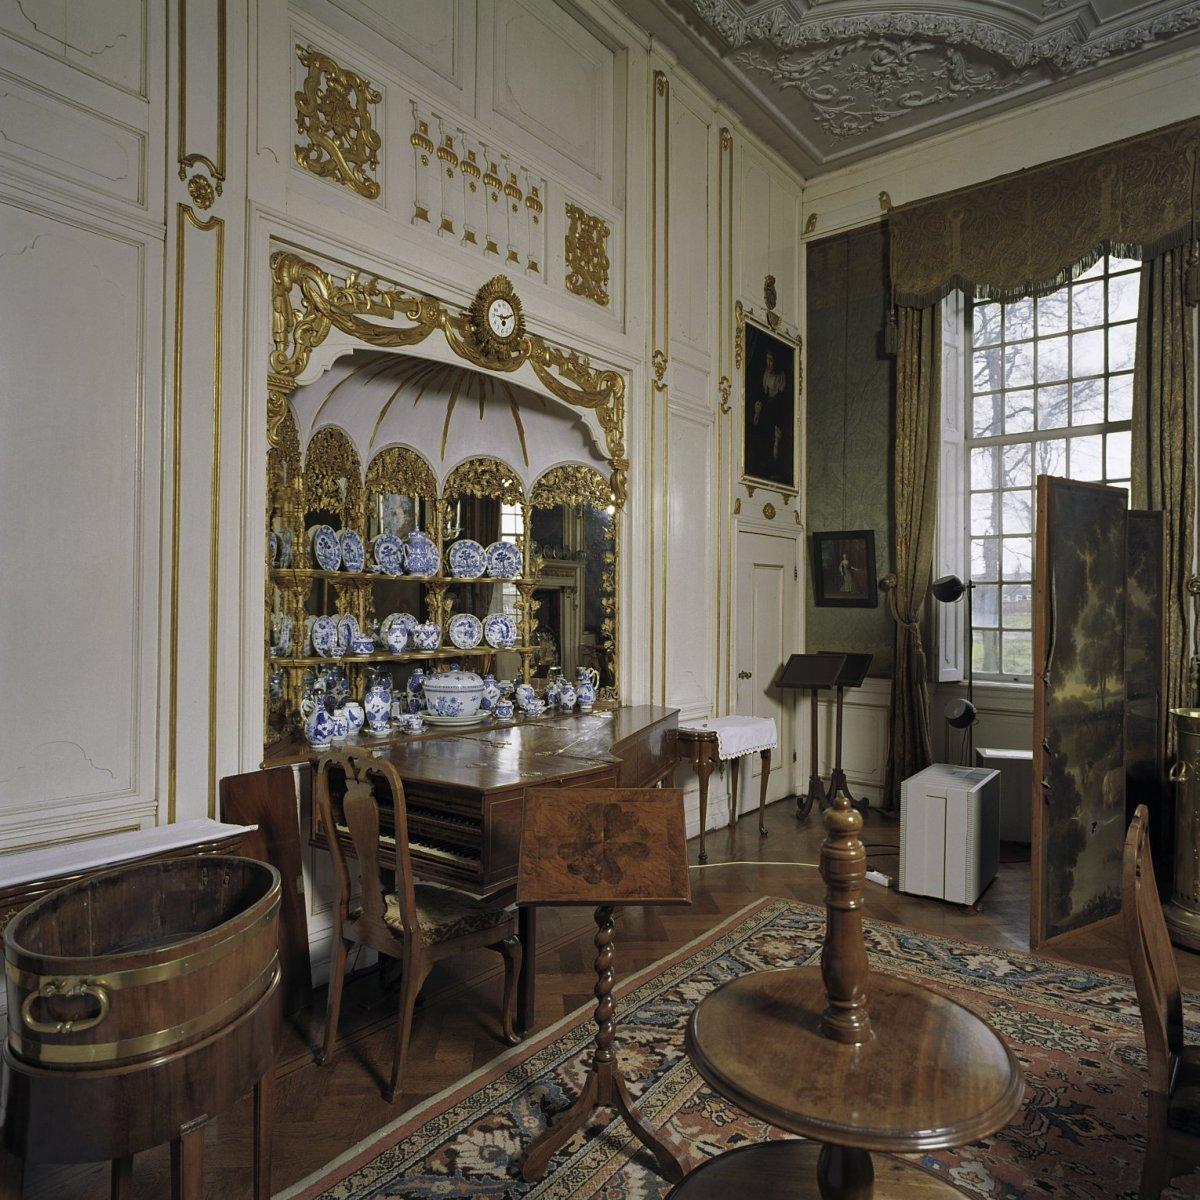 Description Interieur, eetkamer, open vitrinekast met serviesgoed en ...